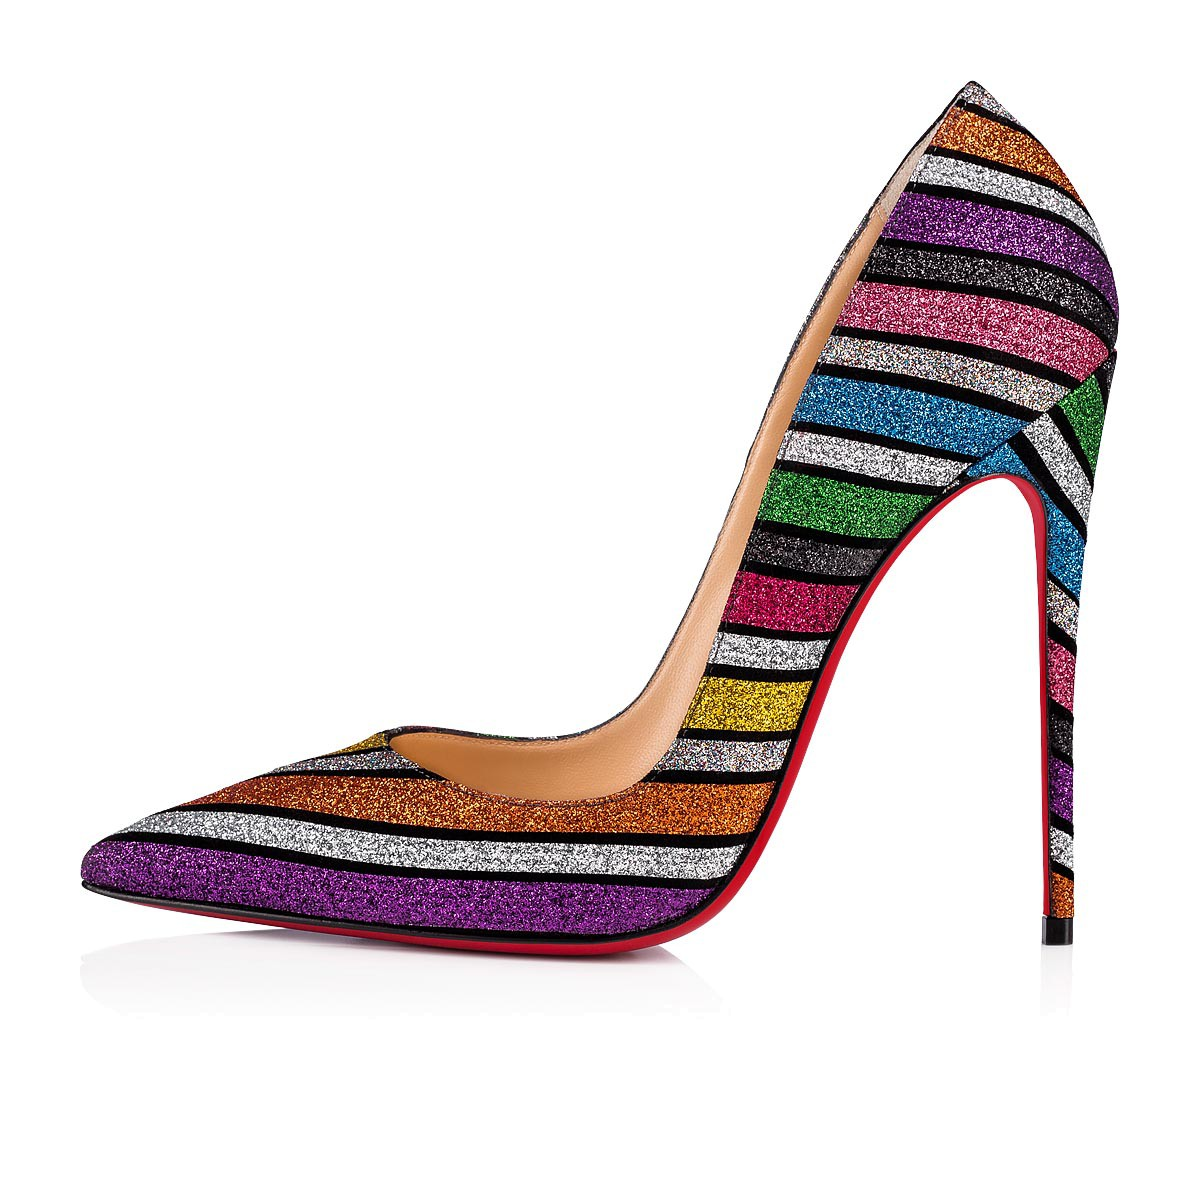 ebbde3a96f83 So Kate Suede Stripyglitter 120 Multicolor Suede - Women Shoes ...